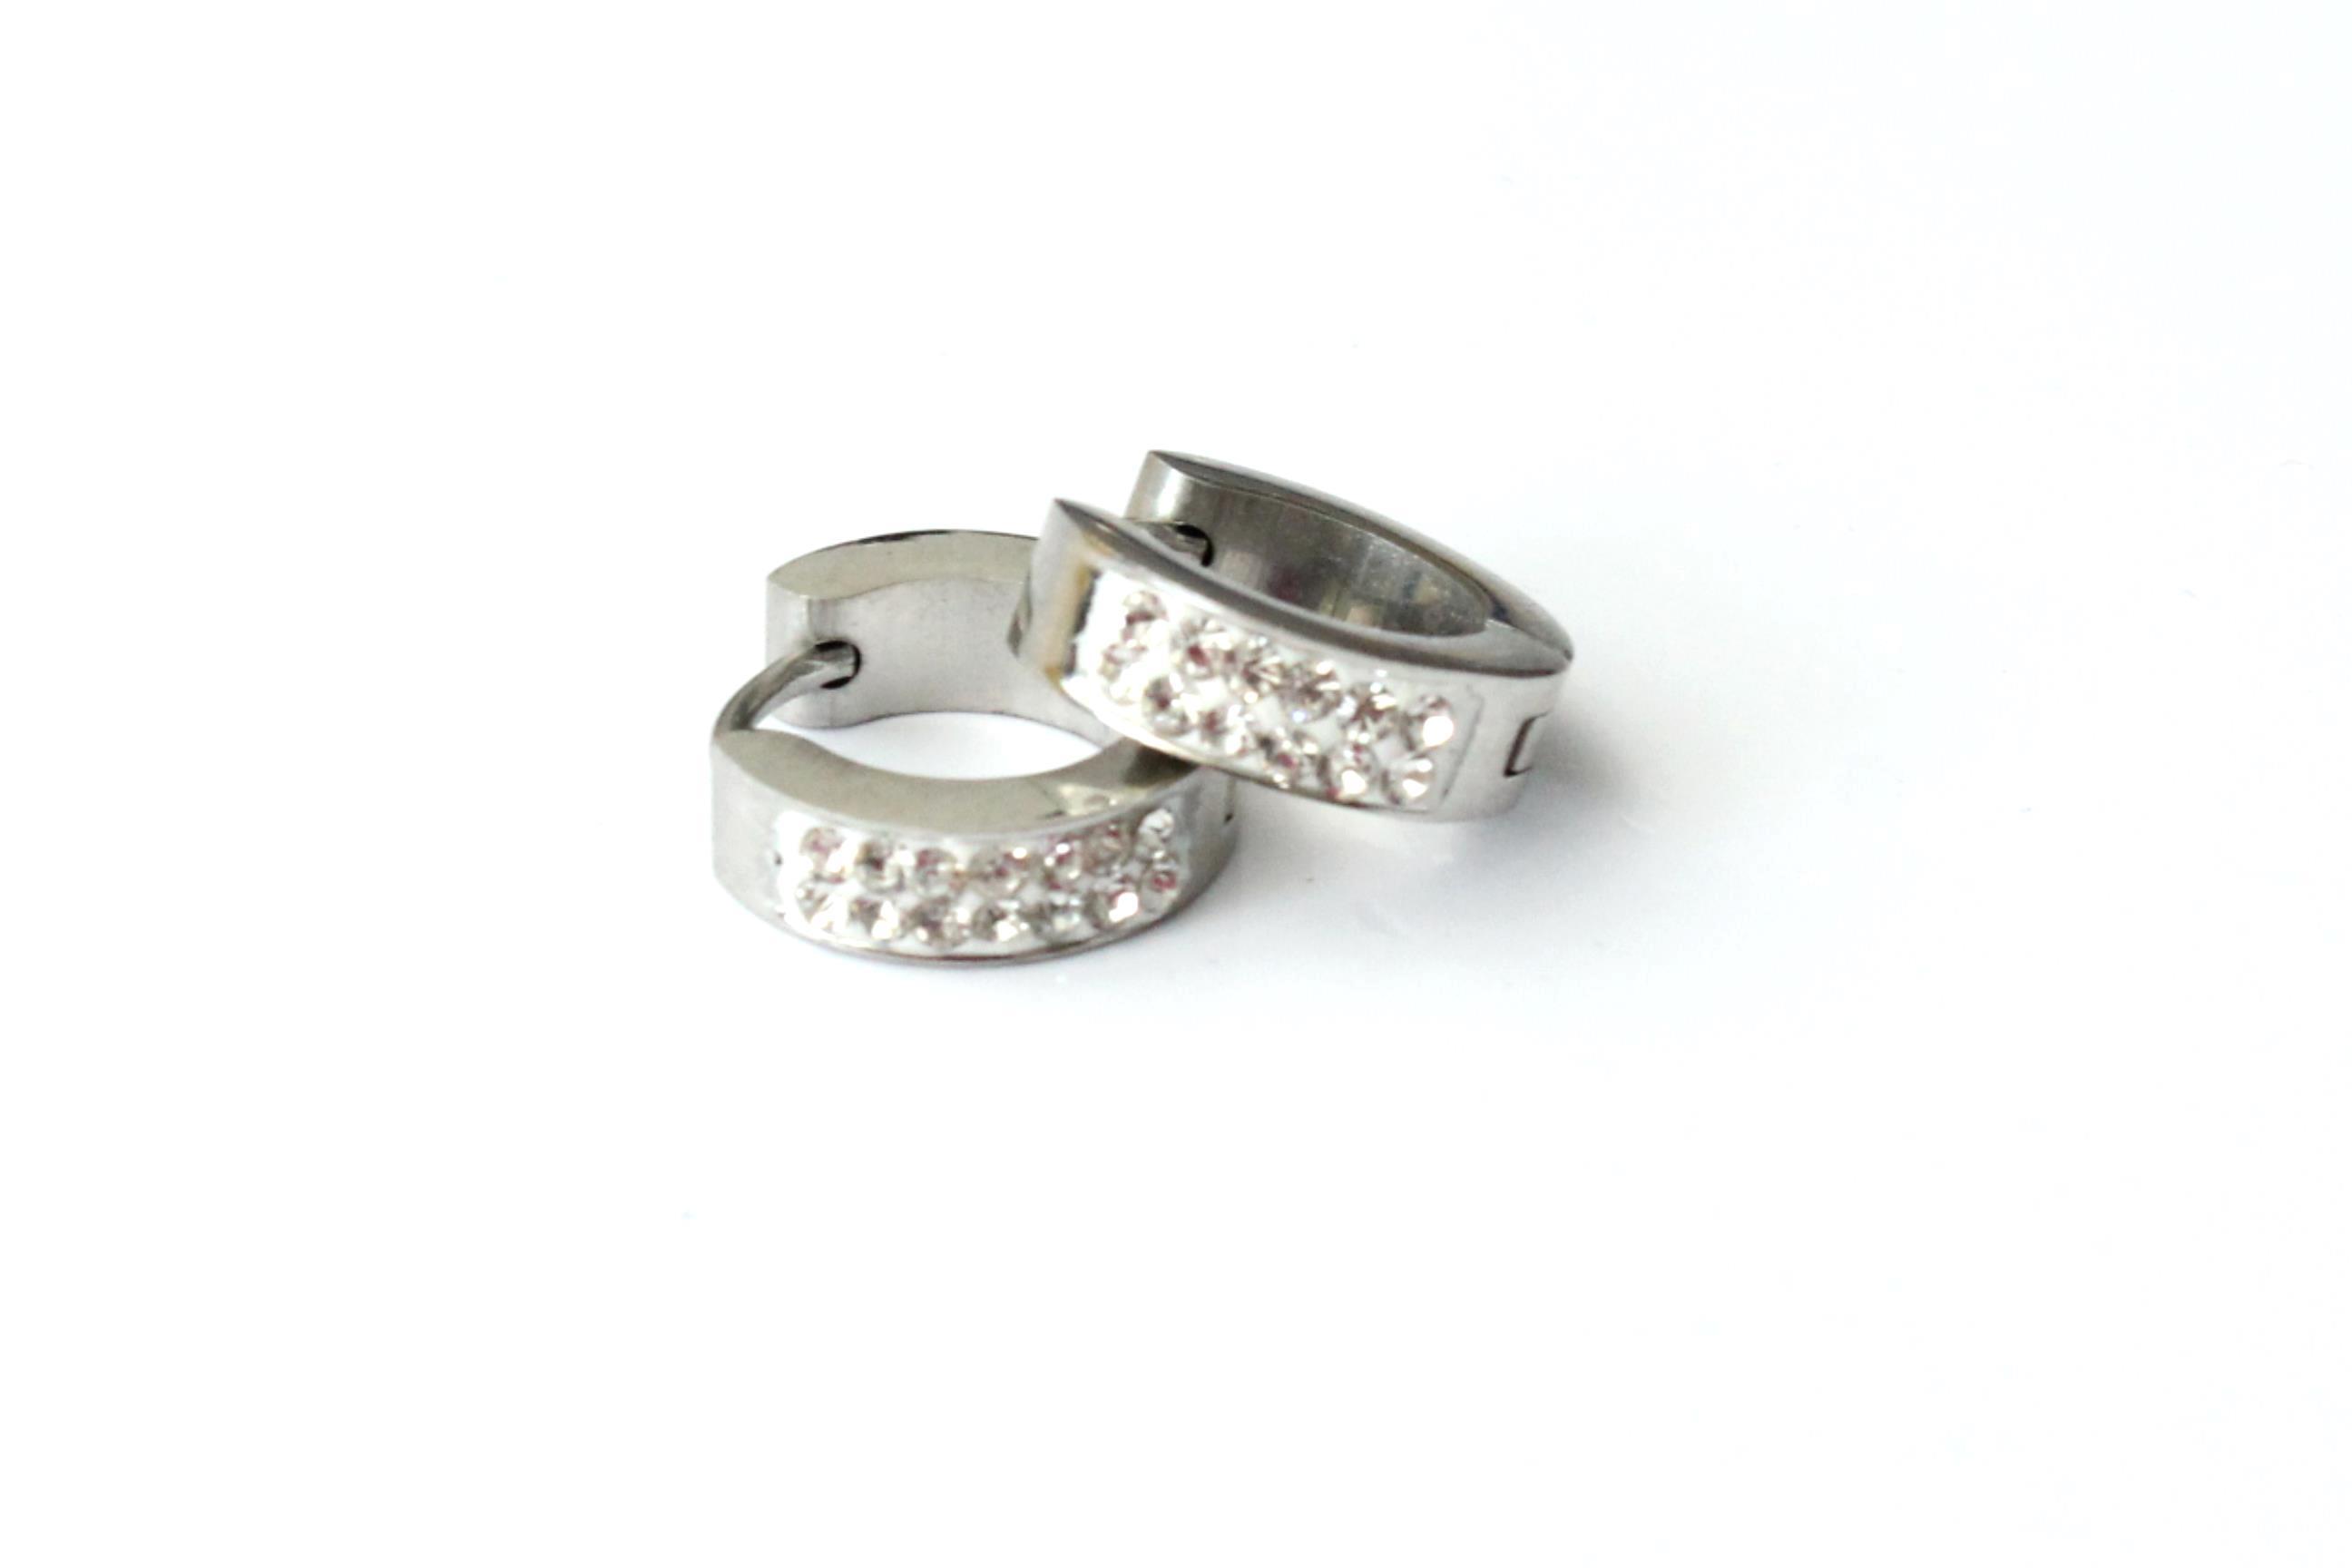 ebac0fc9f Šperky chirurgická oceľ   Náušnice chirurgická ocel 36   Jedinečné ...